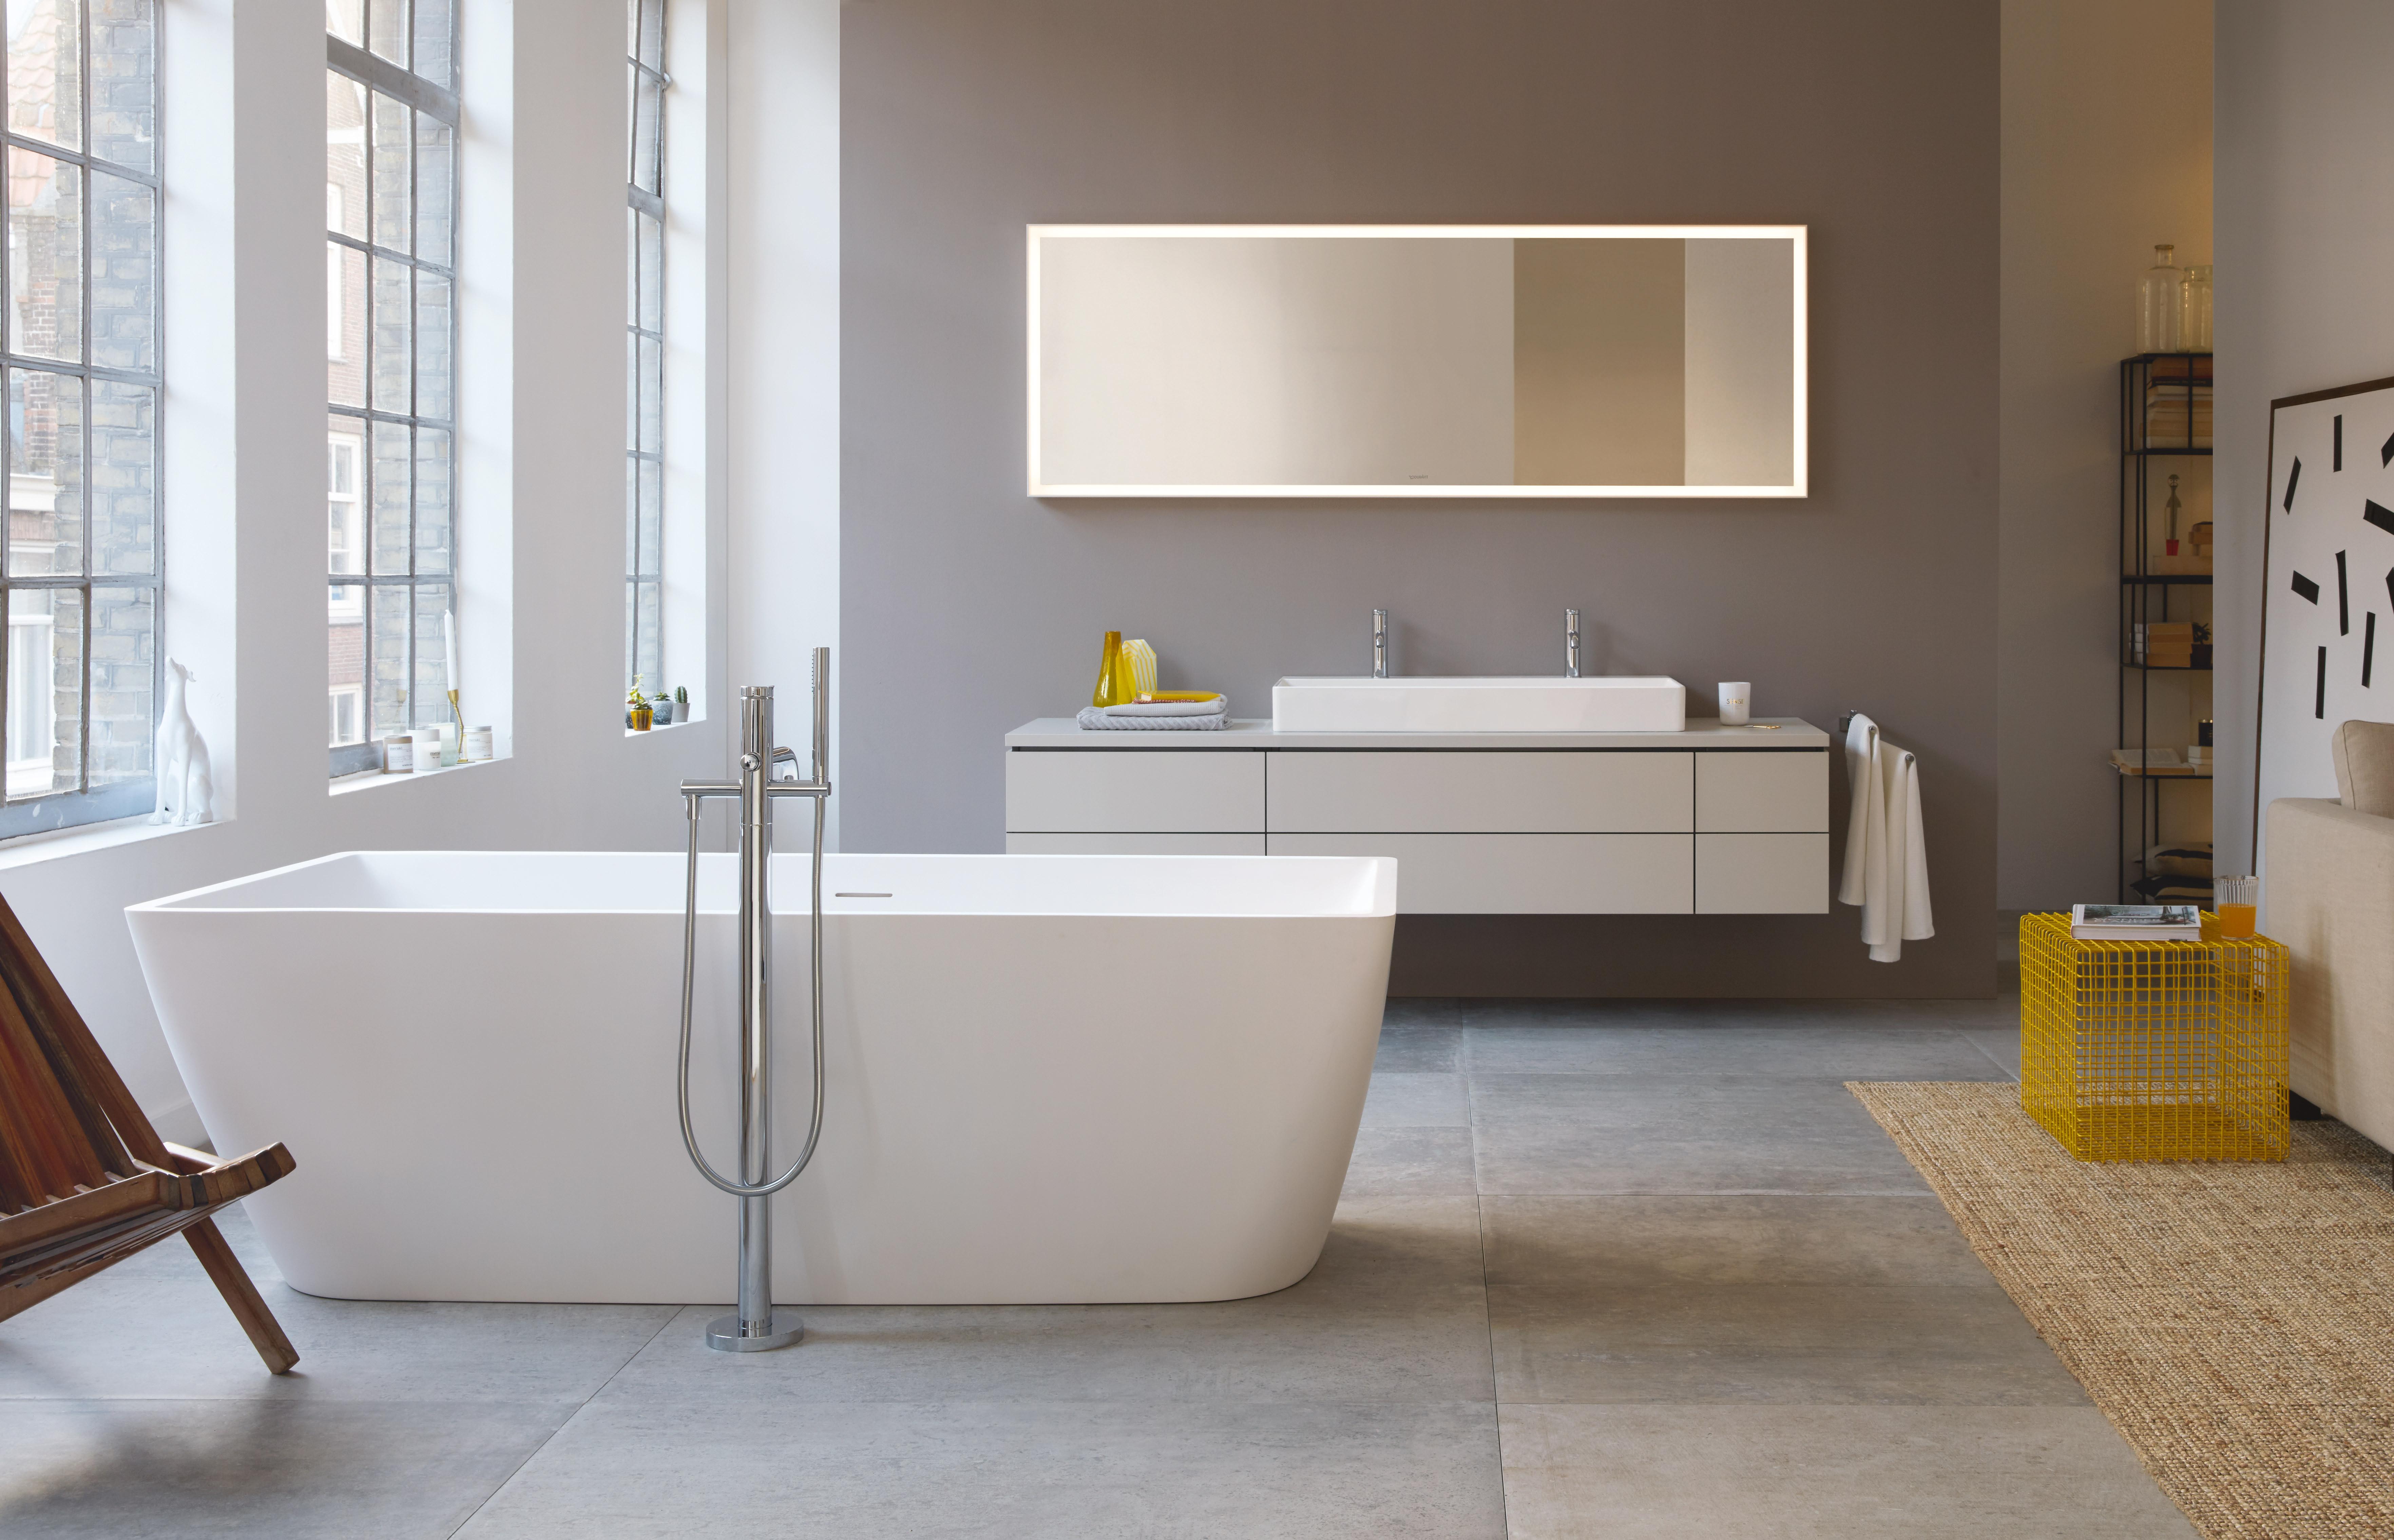 modern bathtubs for your bathroom duravit bathtub duravit. Black Bedroom Furniture Sets. Home Design Ideas